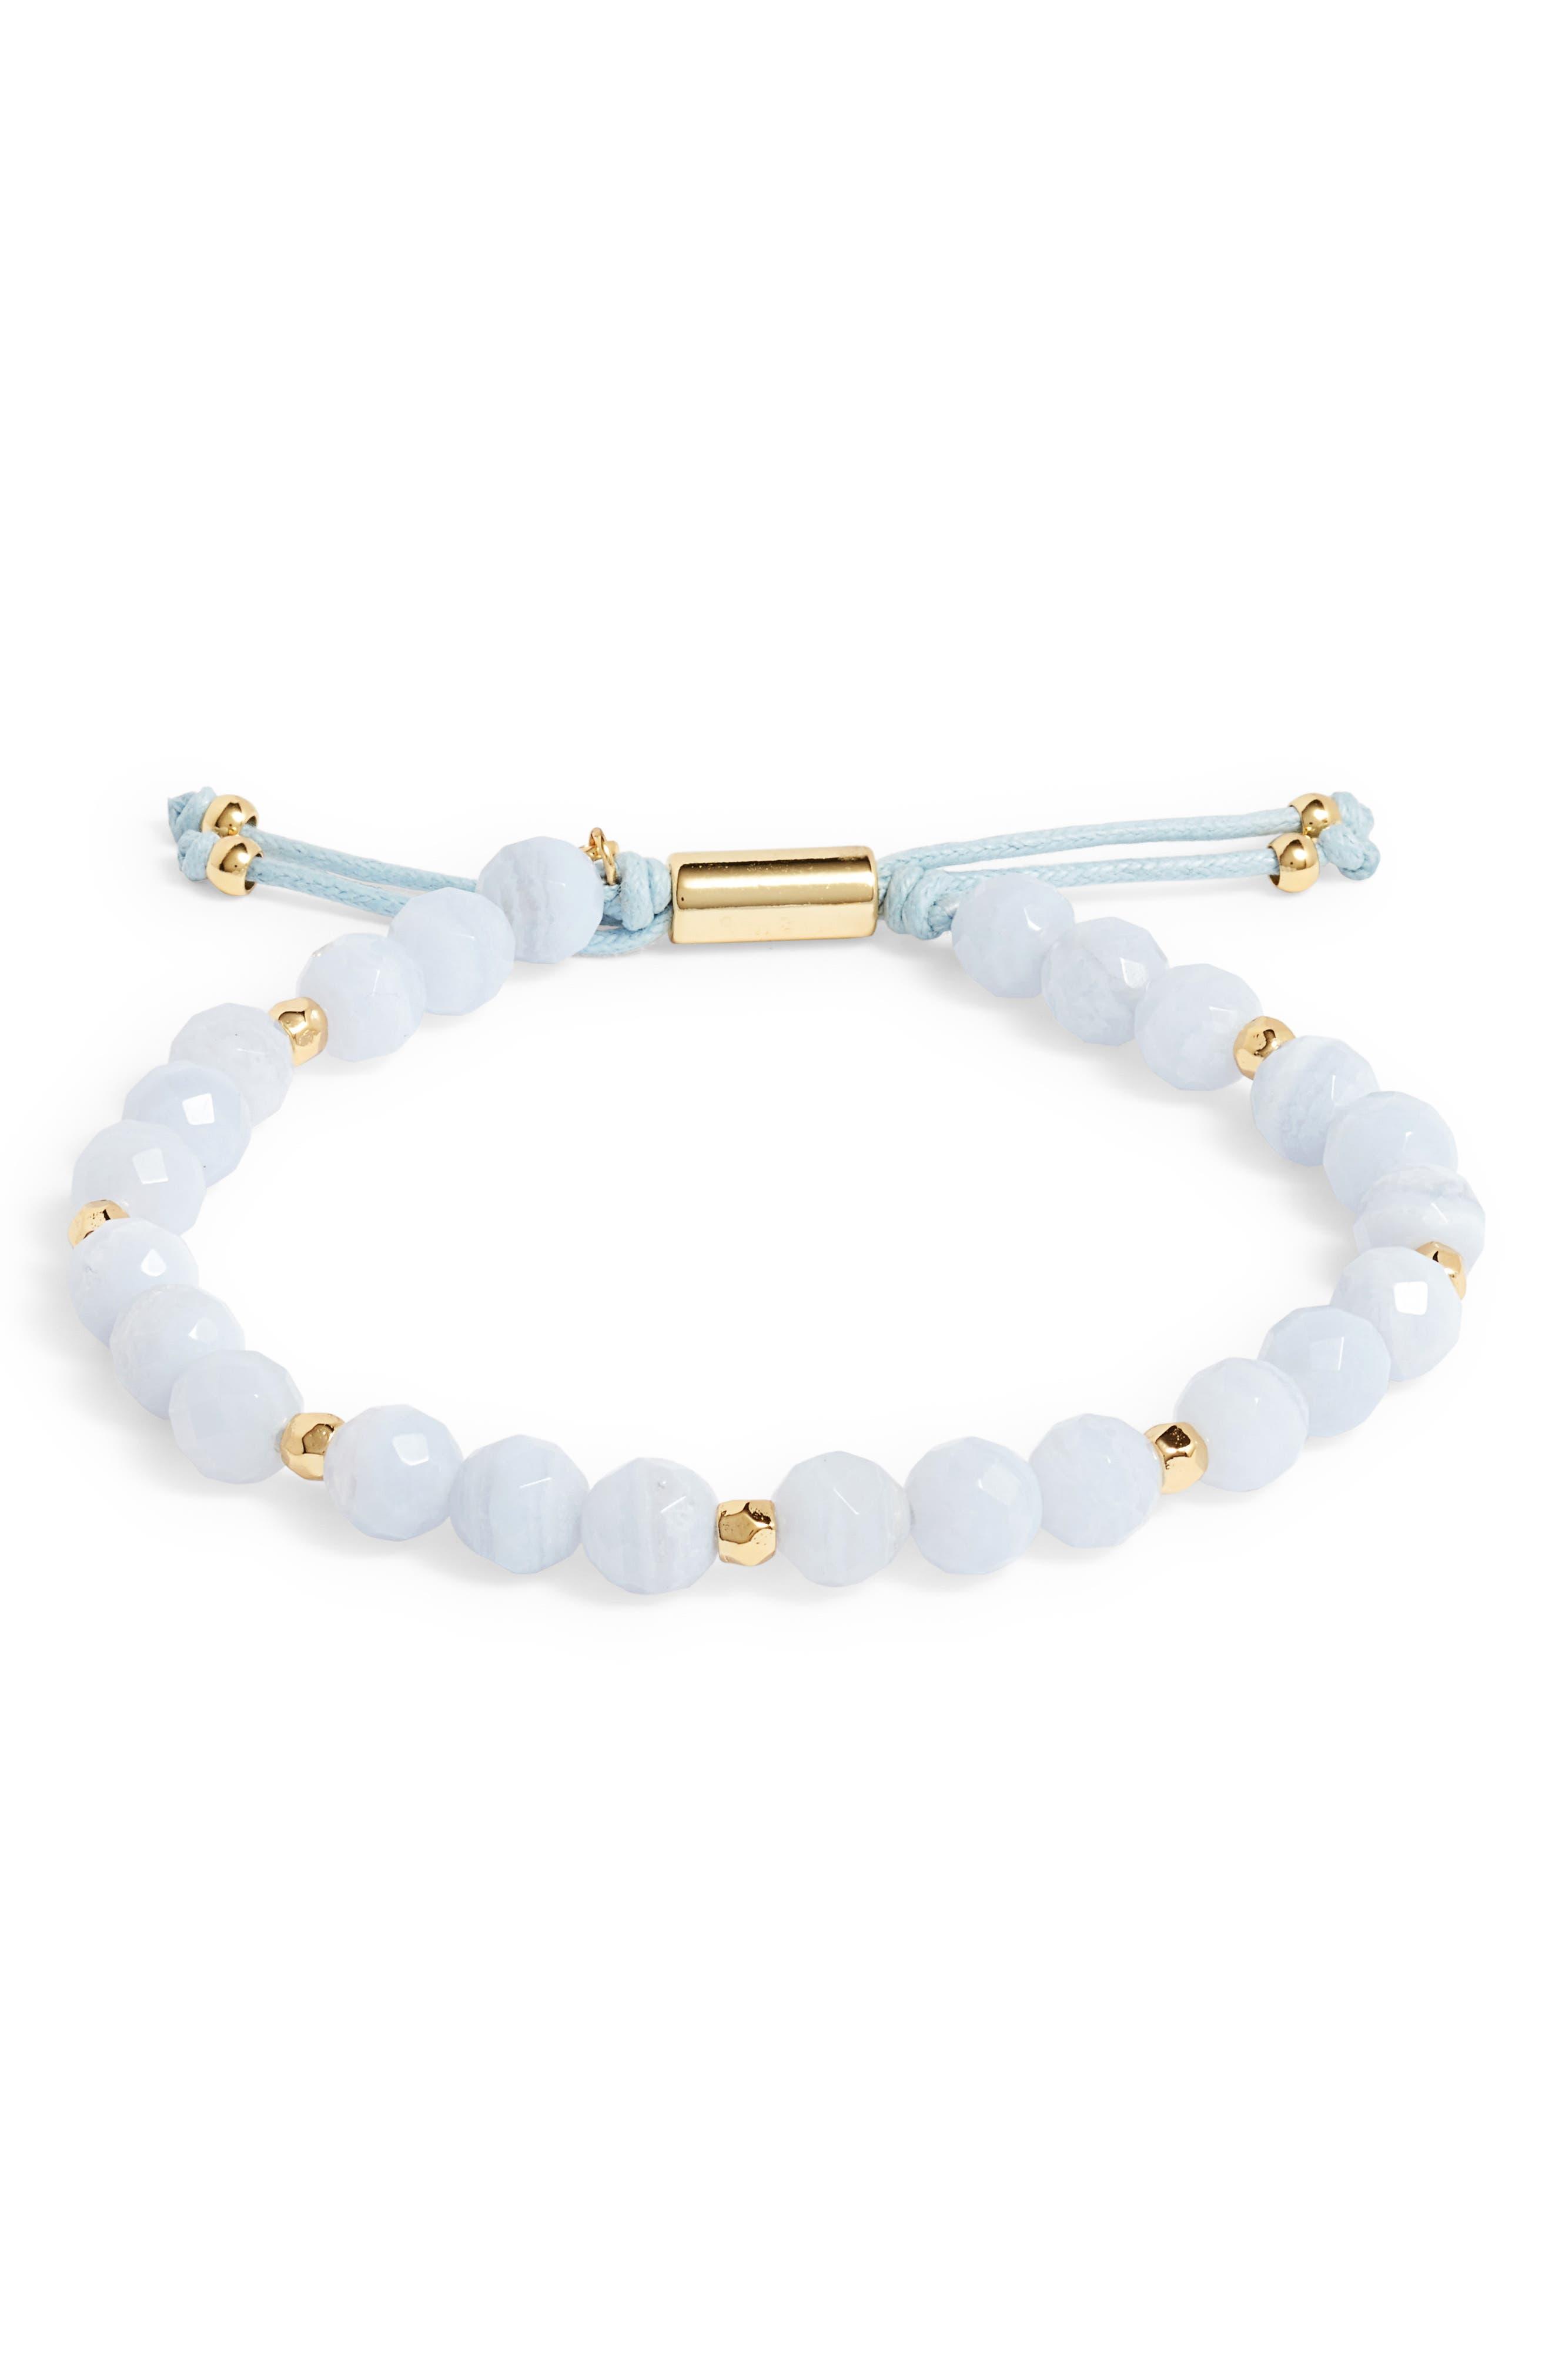 Self Expression Gemstone Bracelet,                         Main,                         color, Blue Lace Agate/ Gold